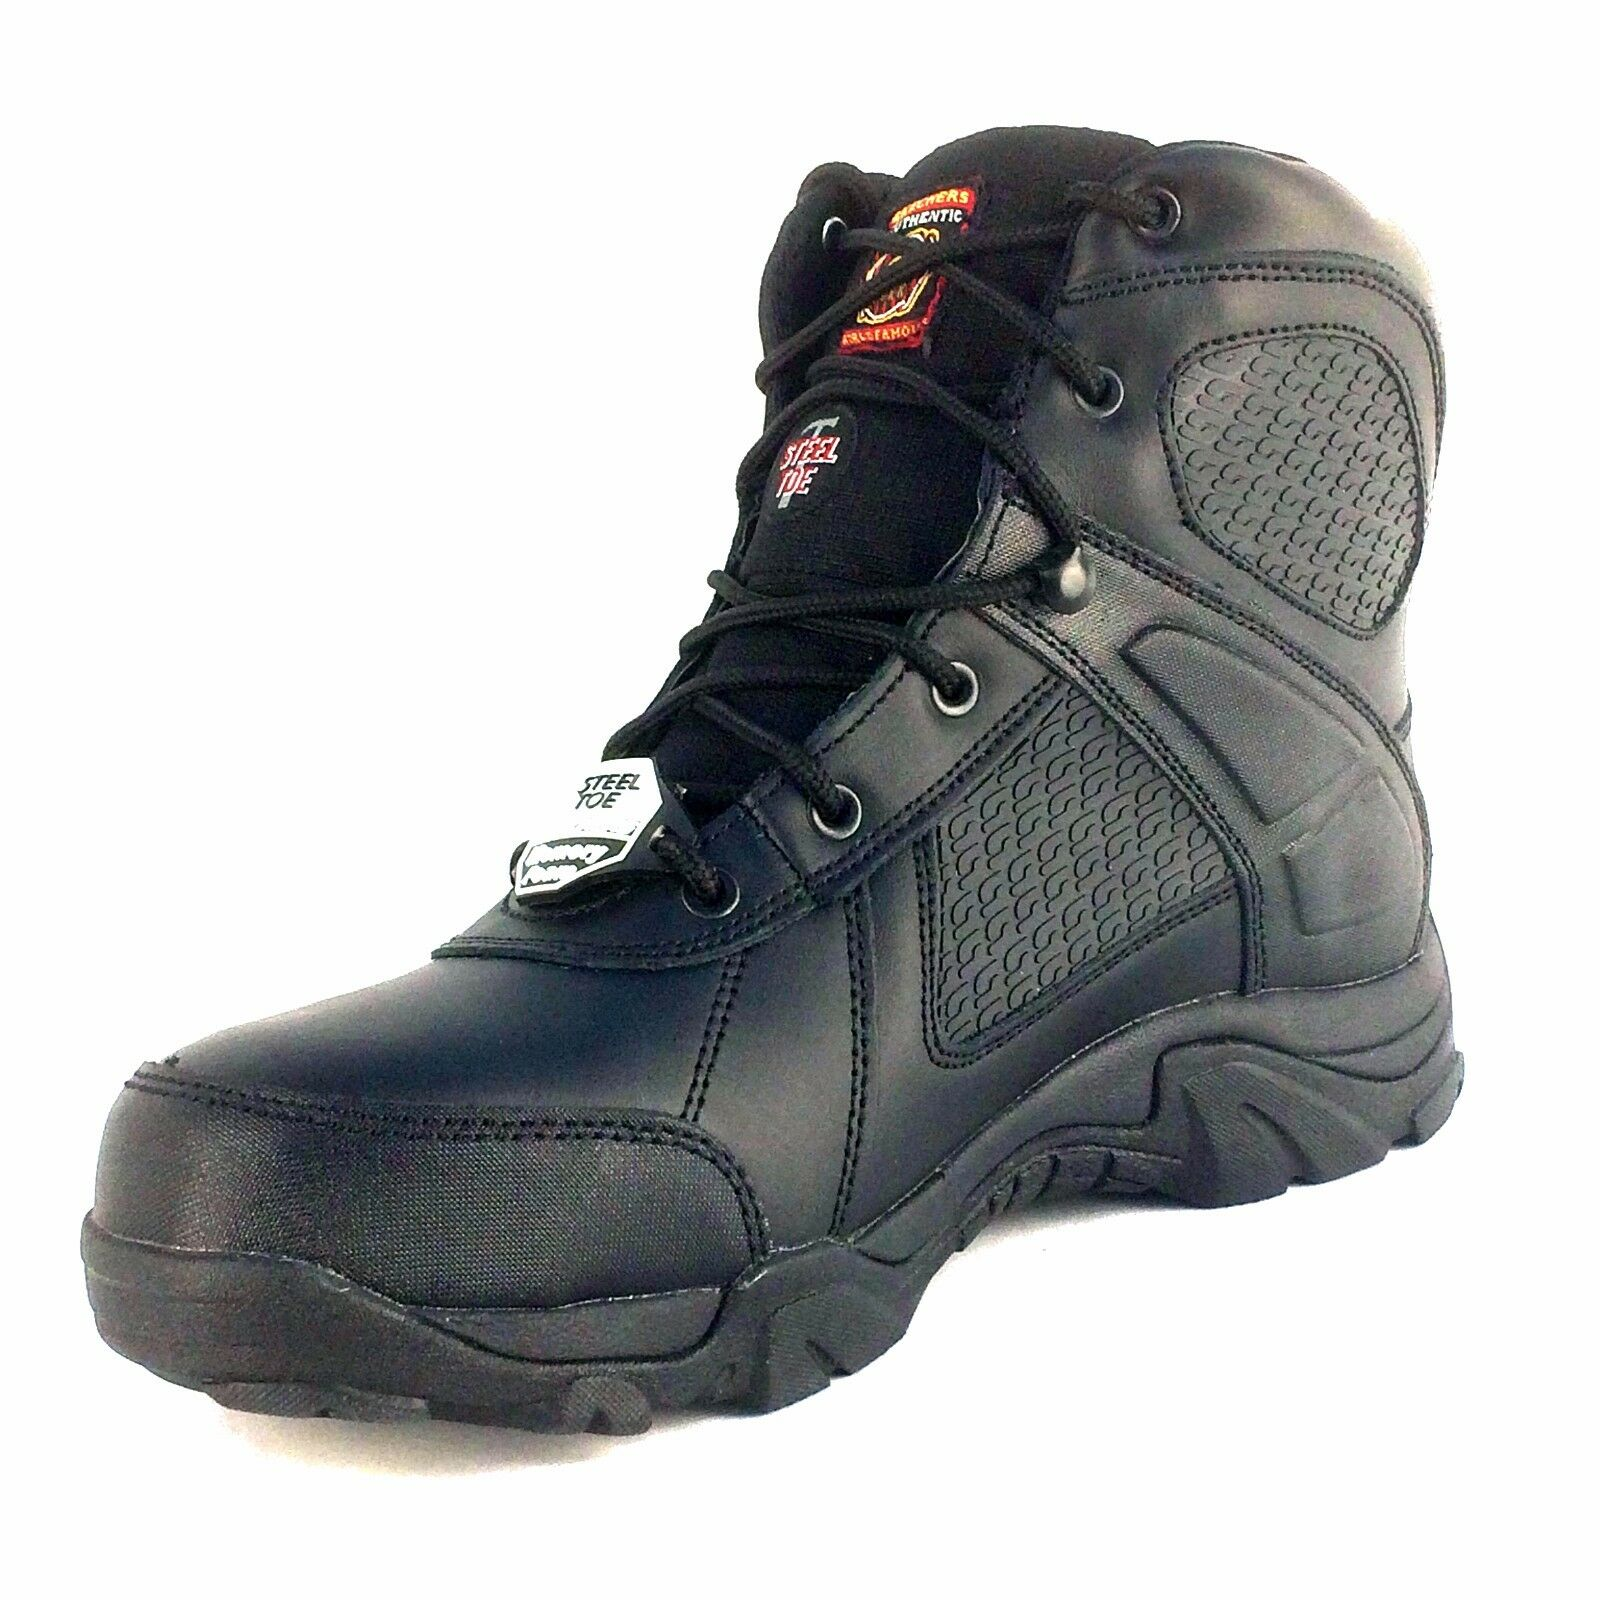 skechers work boots. picture 1 of 12 skechers work boots